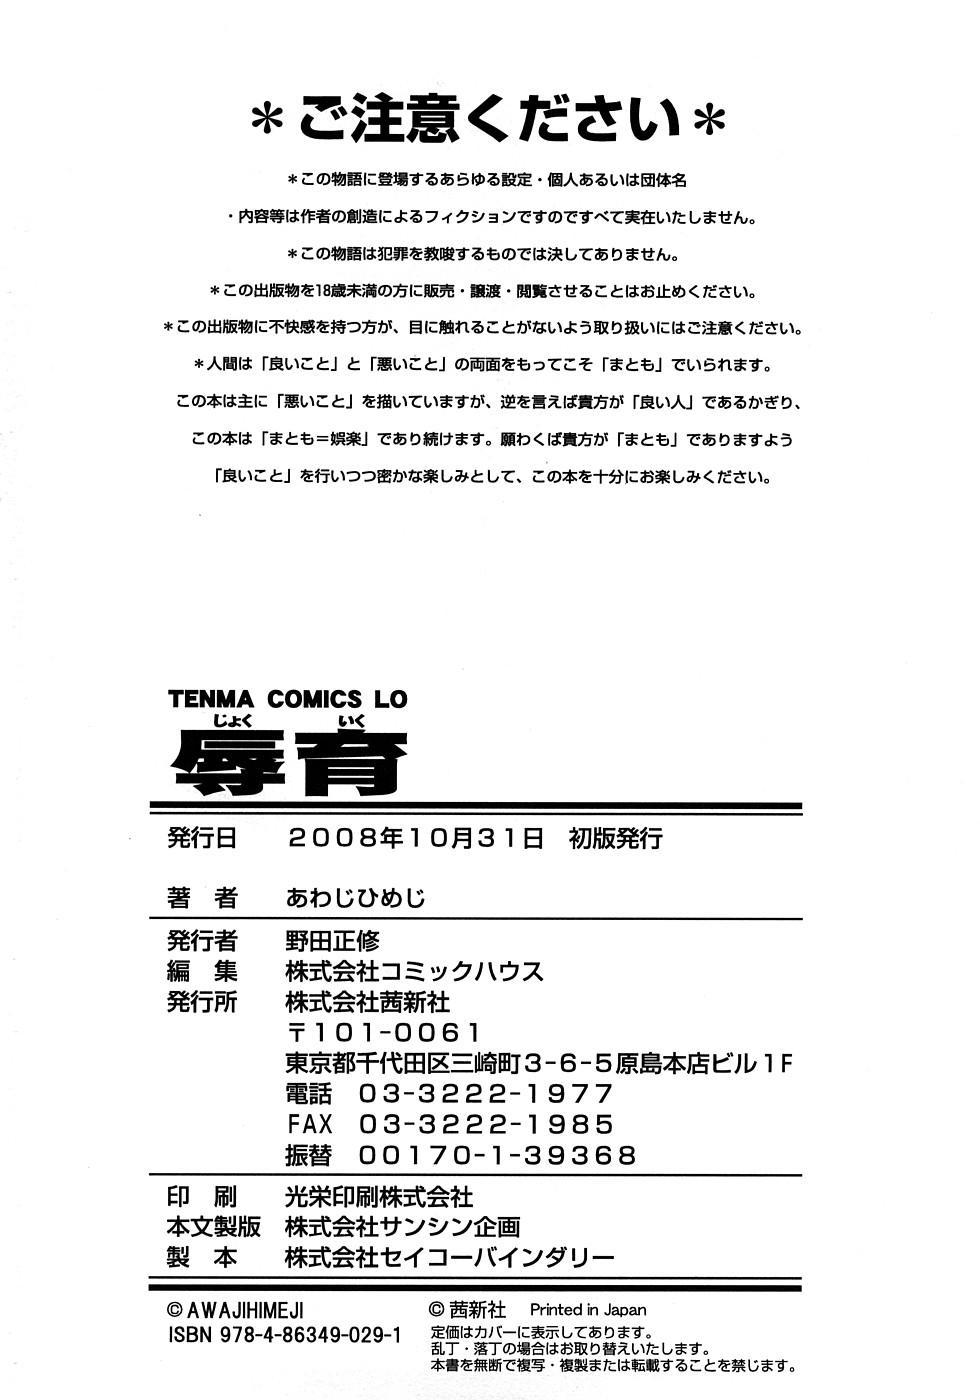 Jyokuiku 198